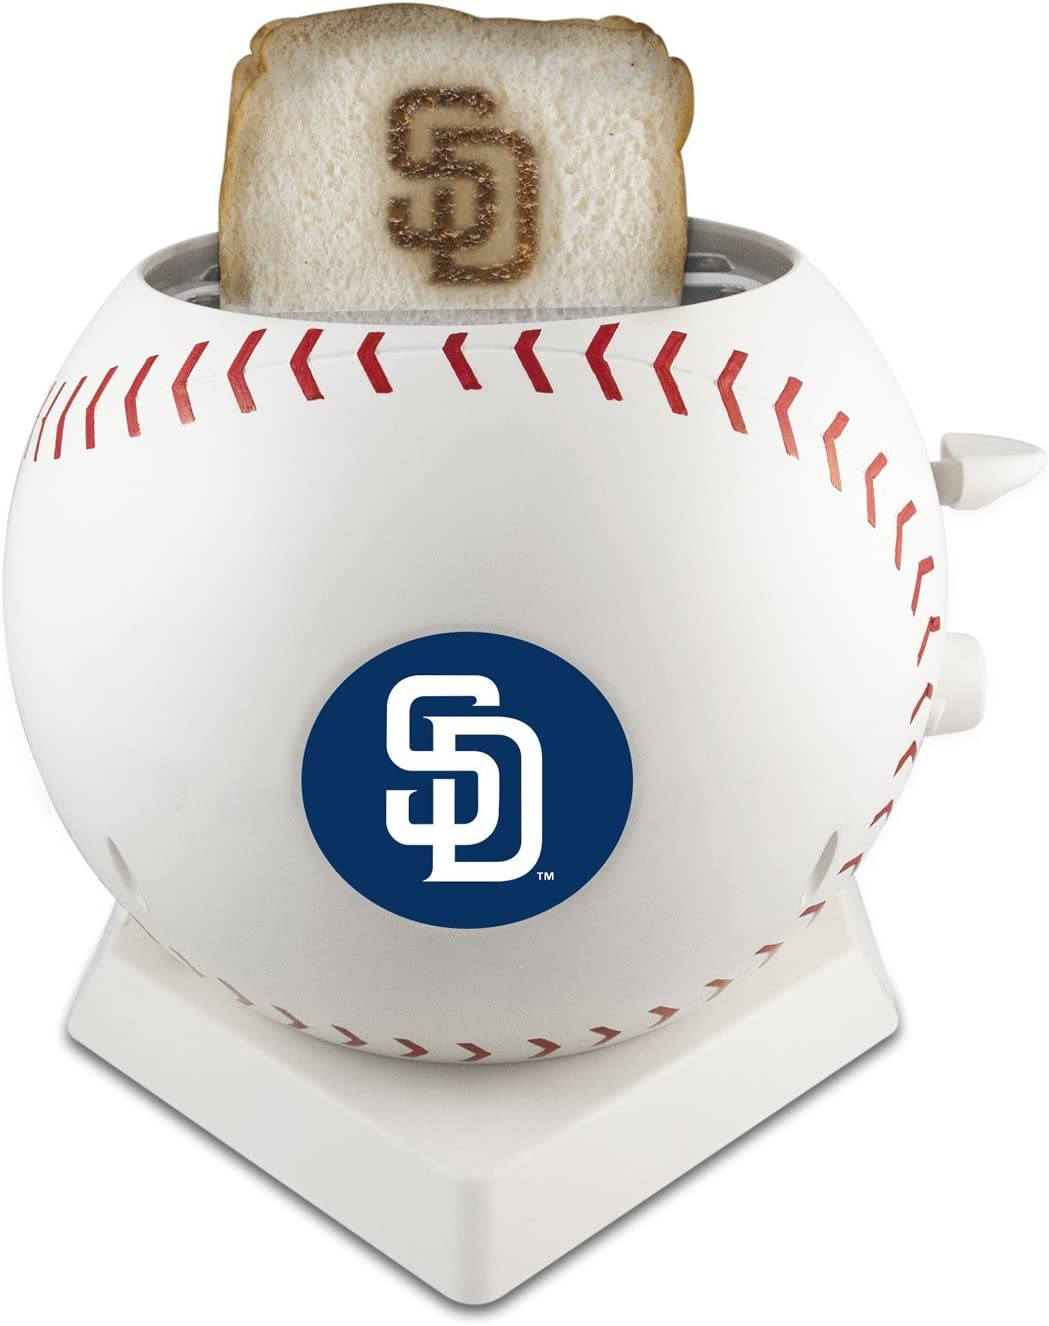 MLB San Diego Padres Pangea Brands ProToast MVP Toaster, White